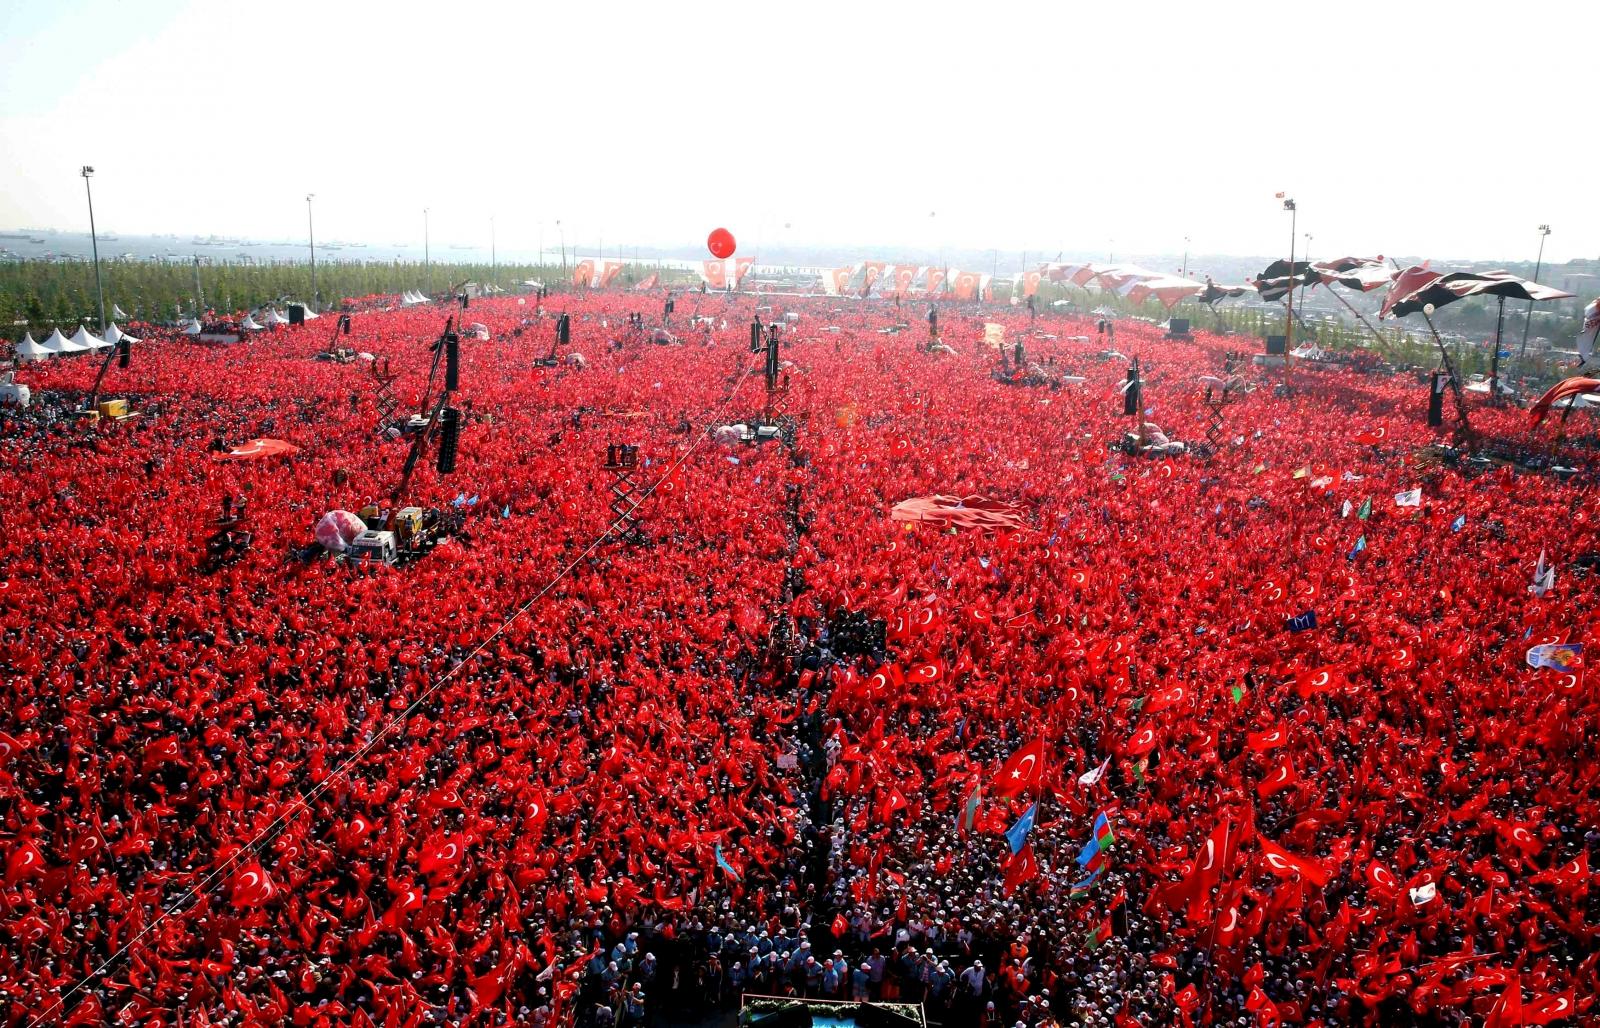 Turkey Democracy and Martyrs' rally